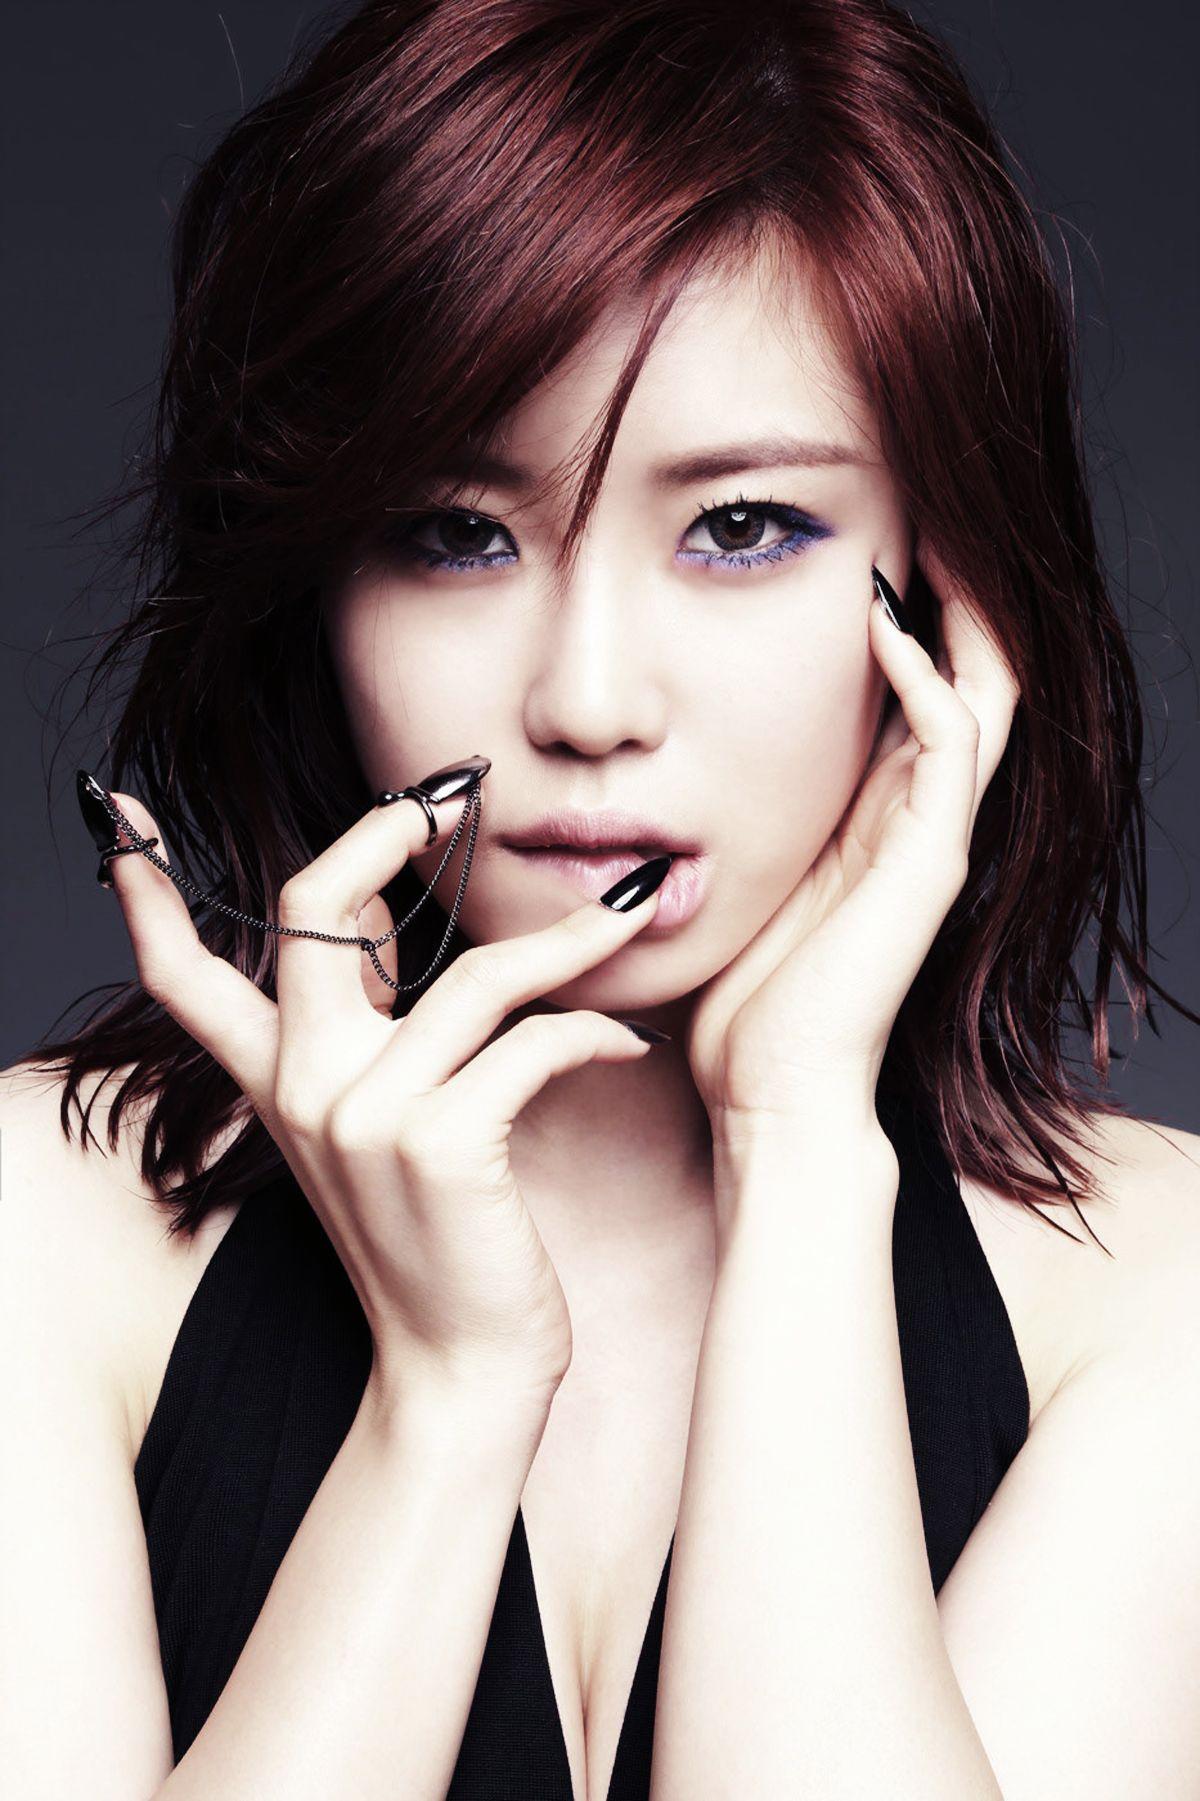 Secret Jeon Hyosung Goodnight Kiss